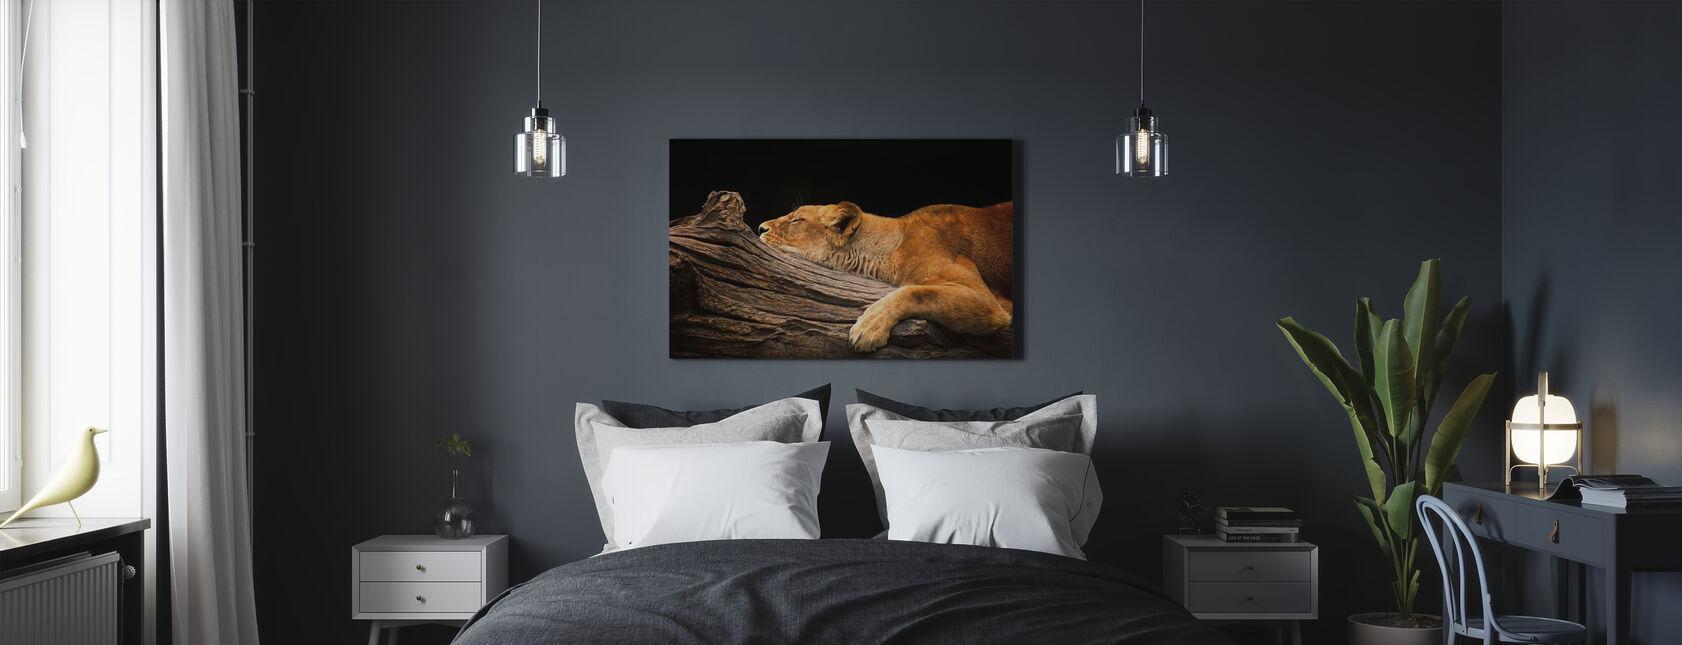 Lejon på logg - Canvastavla - Sovrum